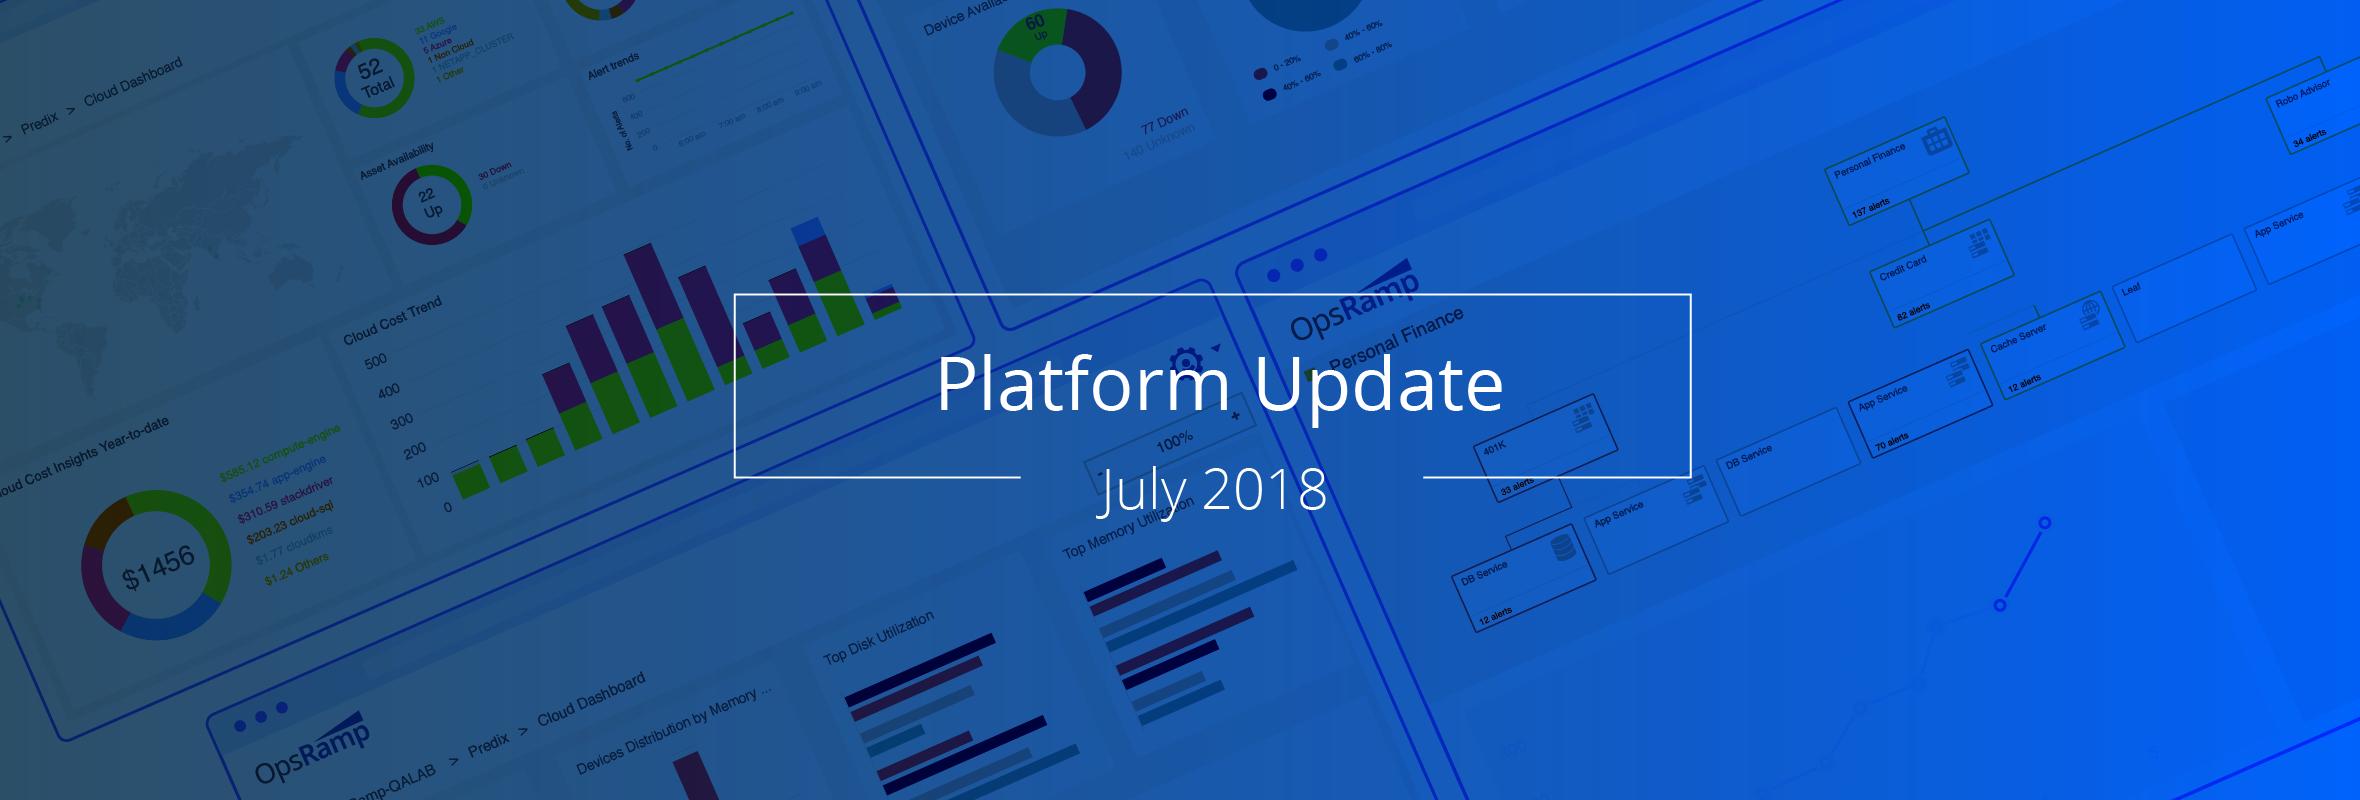 OpsRamp July 2018 Platform Update: Manage Your Hybrid IT Ecosystem Better